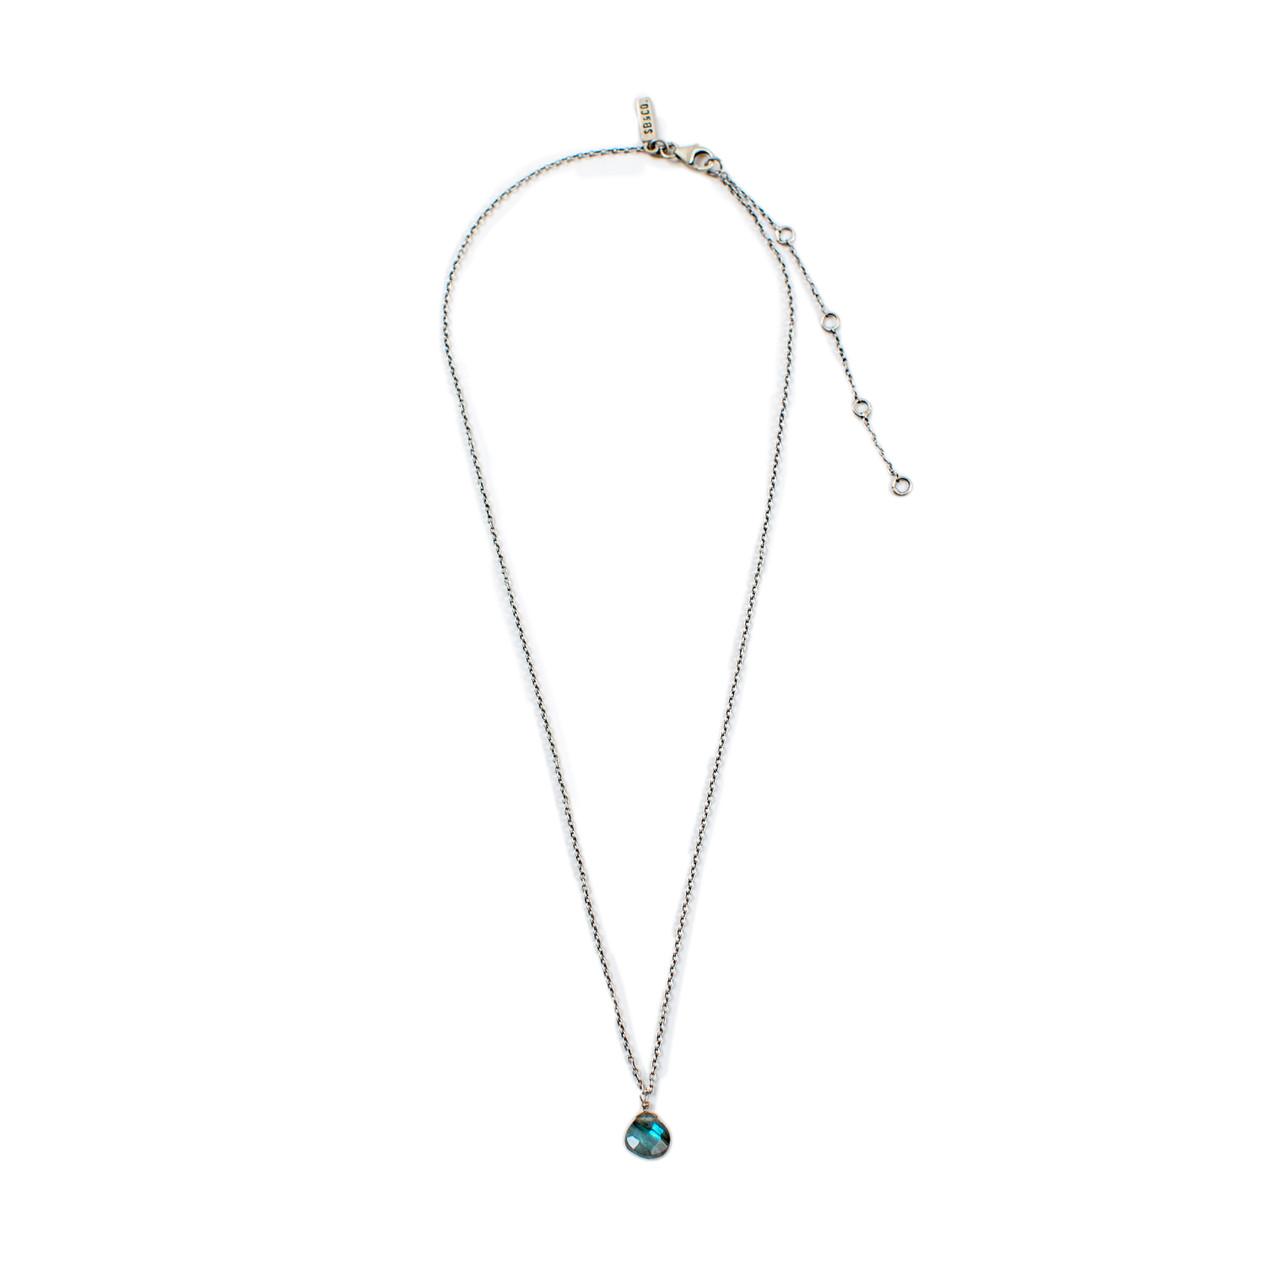 Oxidized Necklace in Labradorite Single Stone